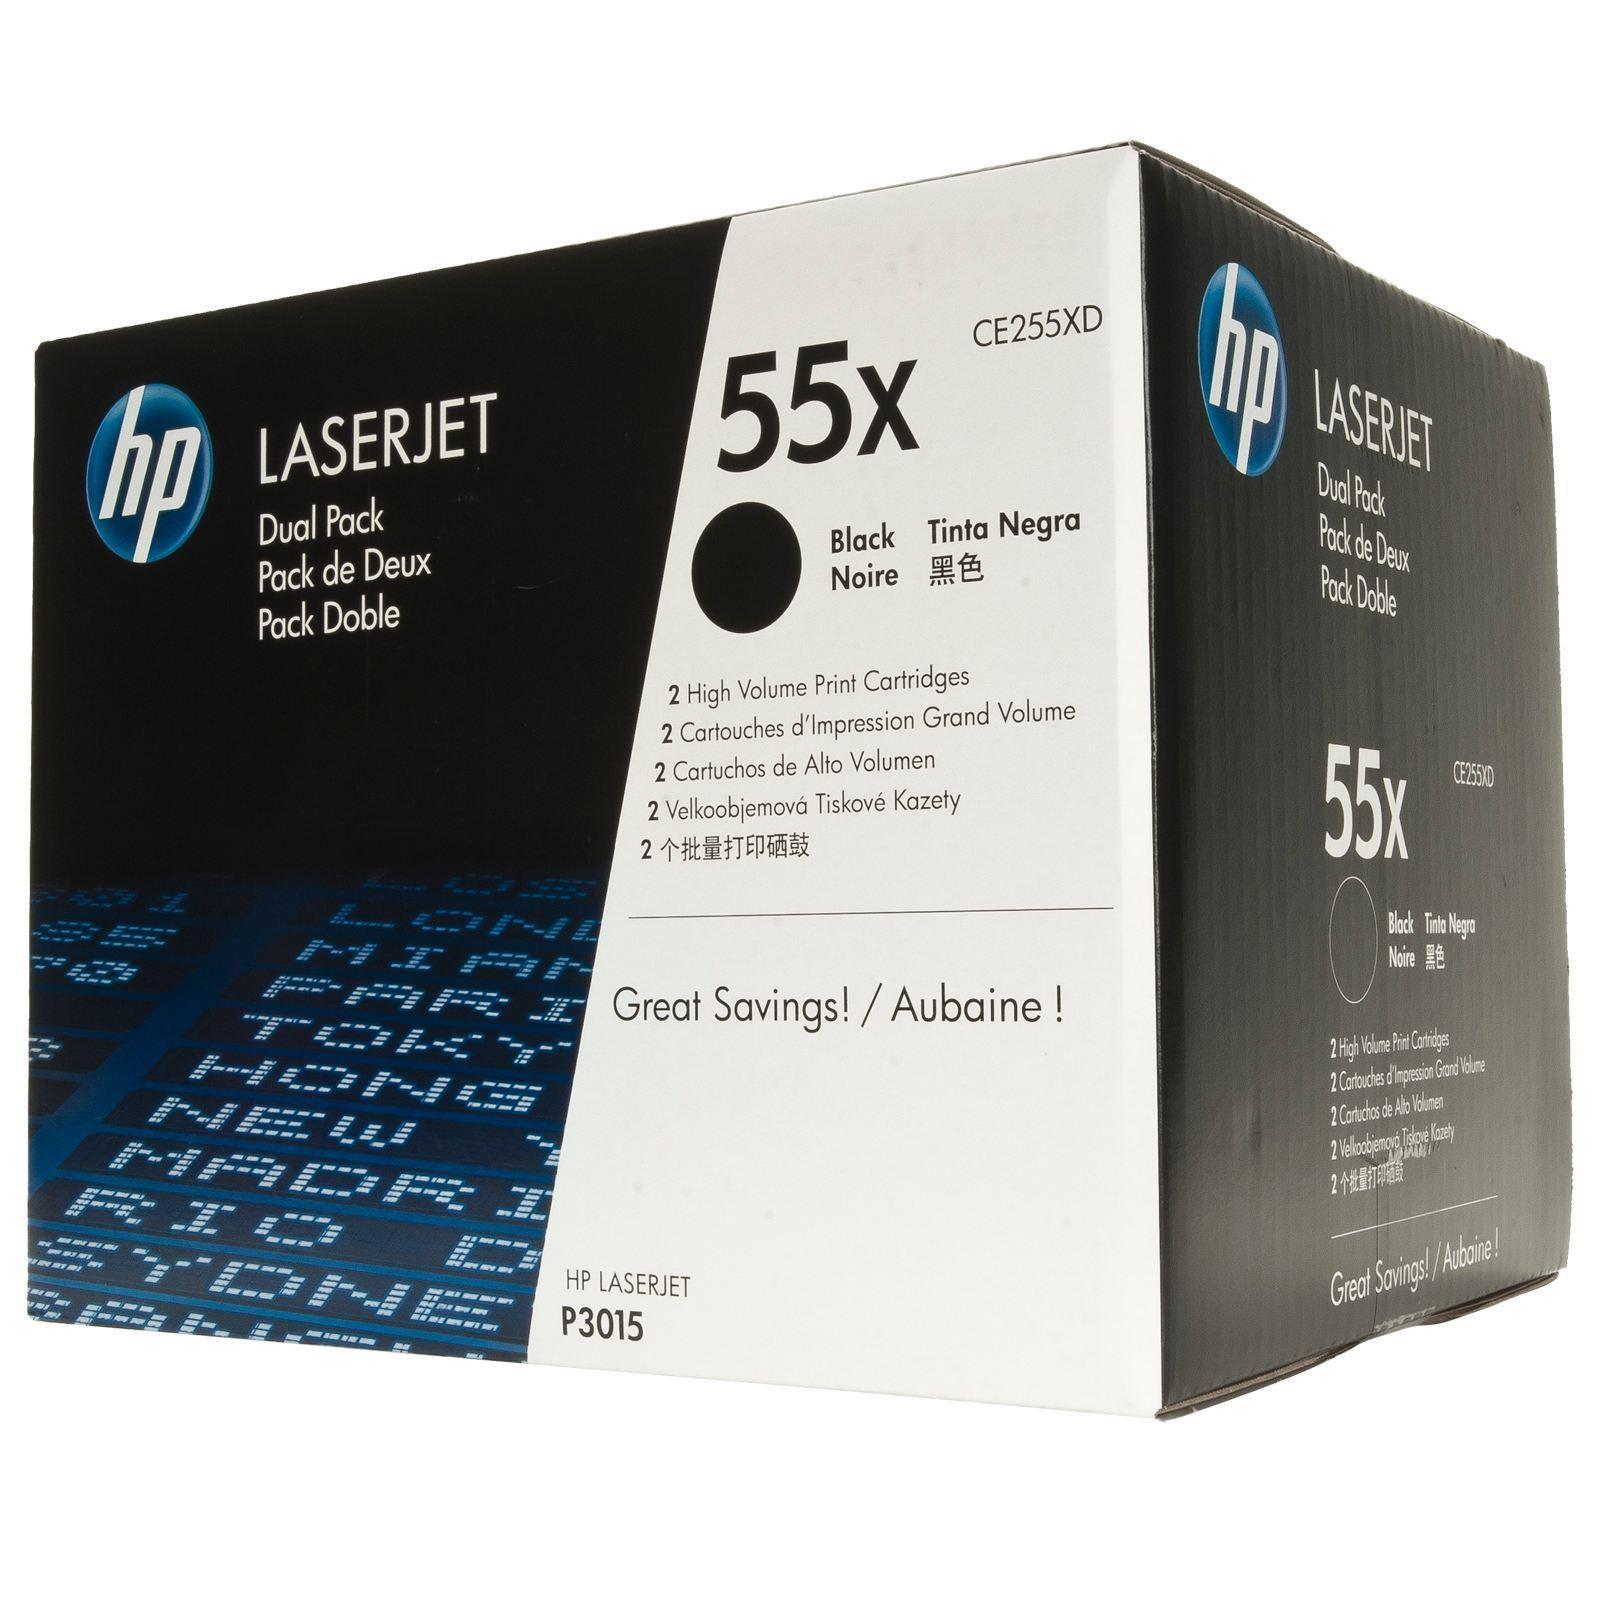 HP CE255XD Original Black Toner Cartridge (Dual Pack) in Retail Packaging